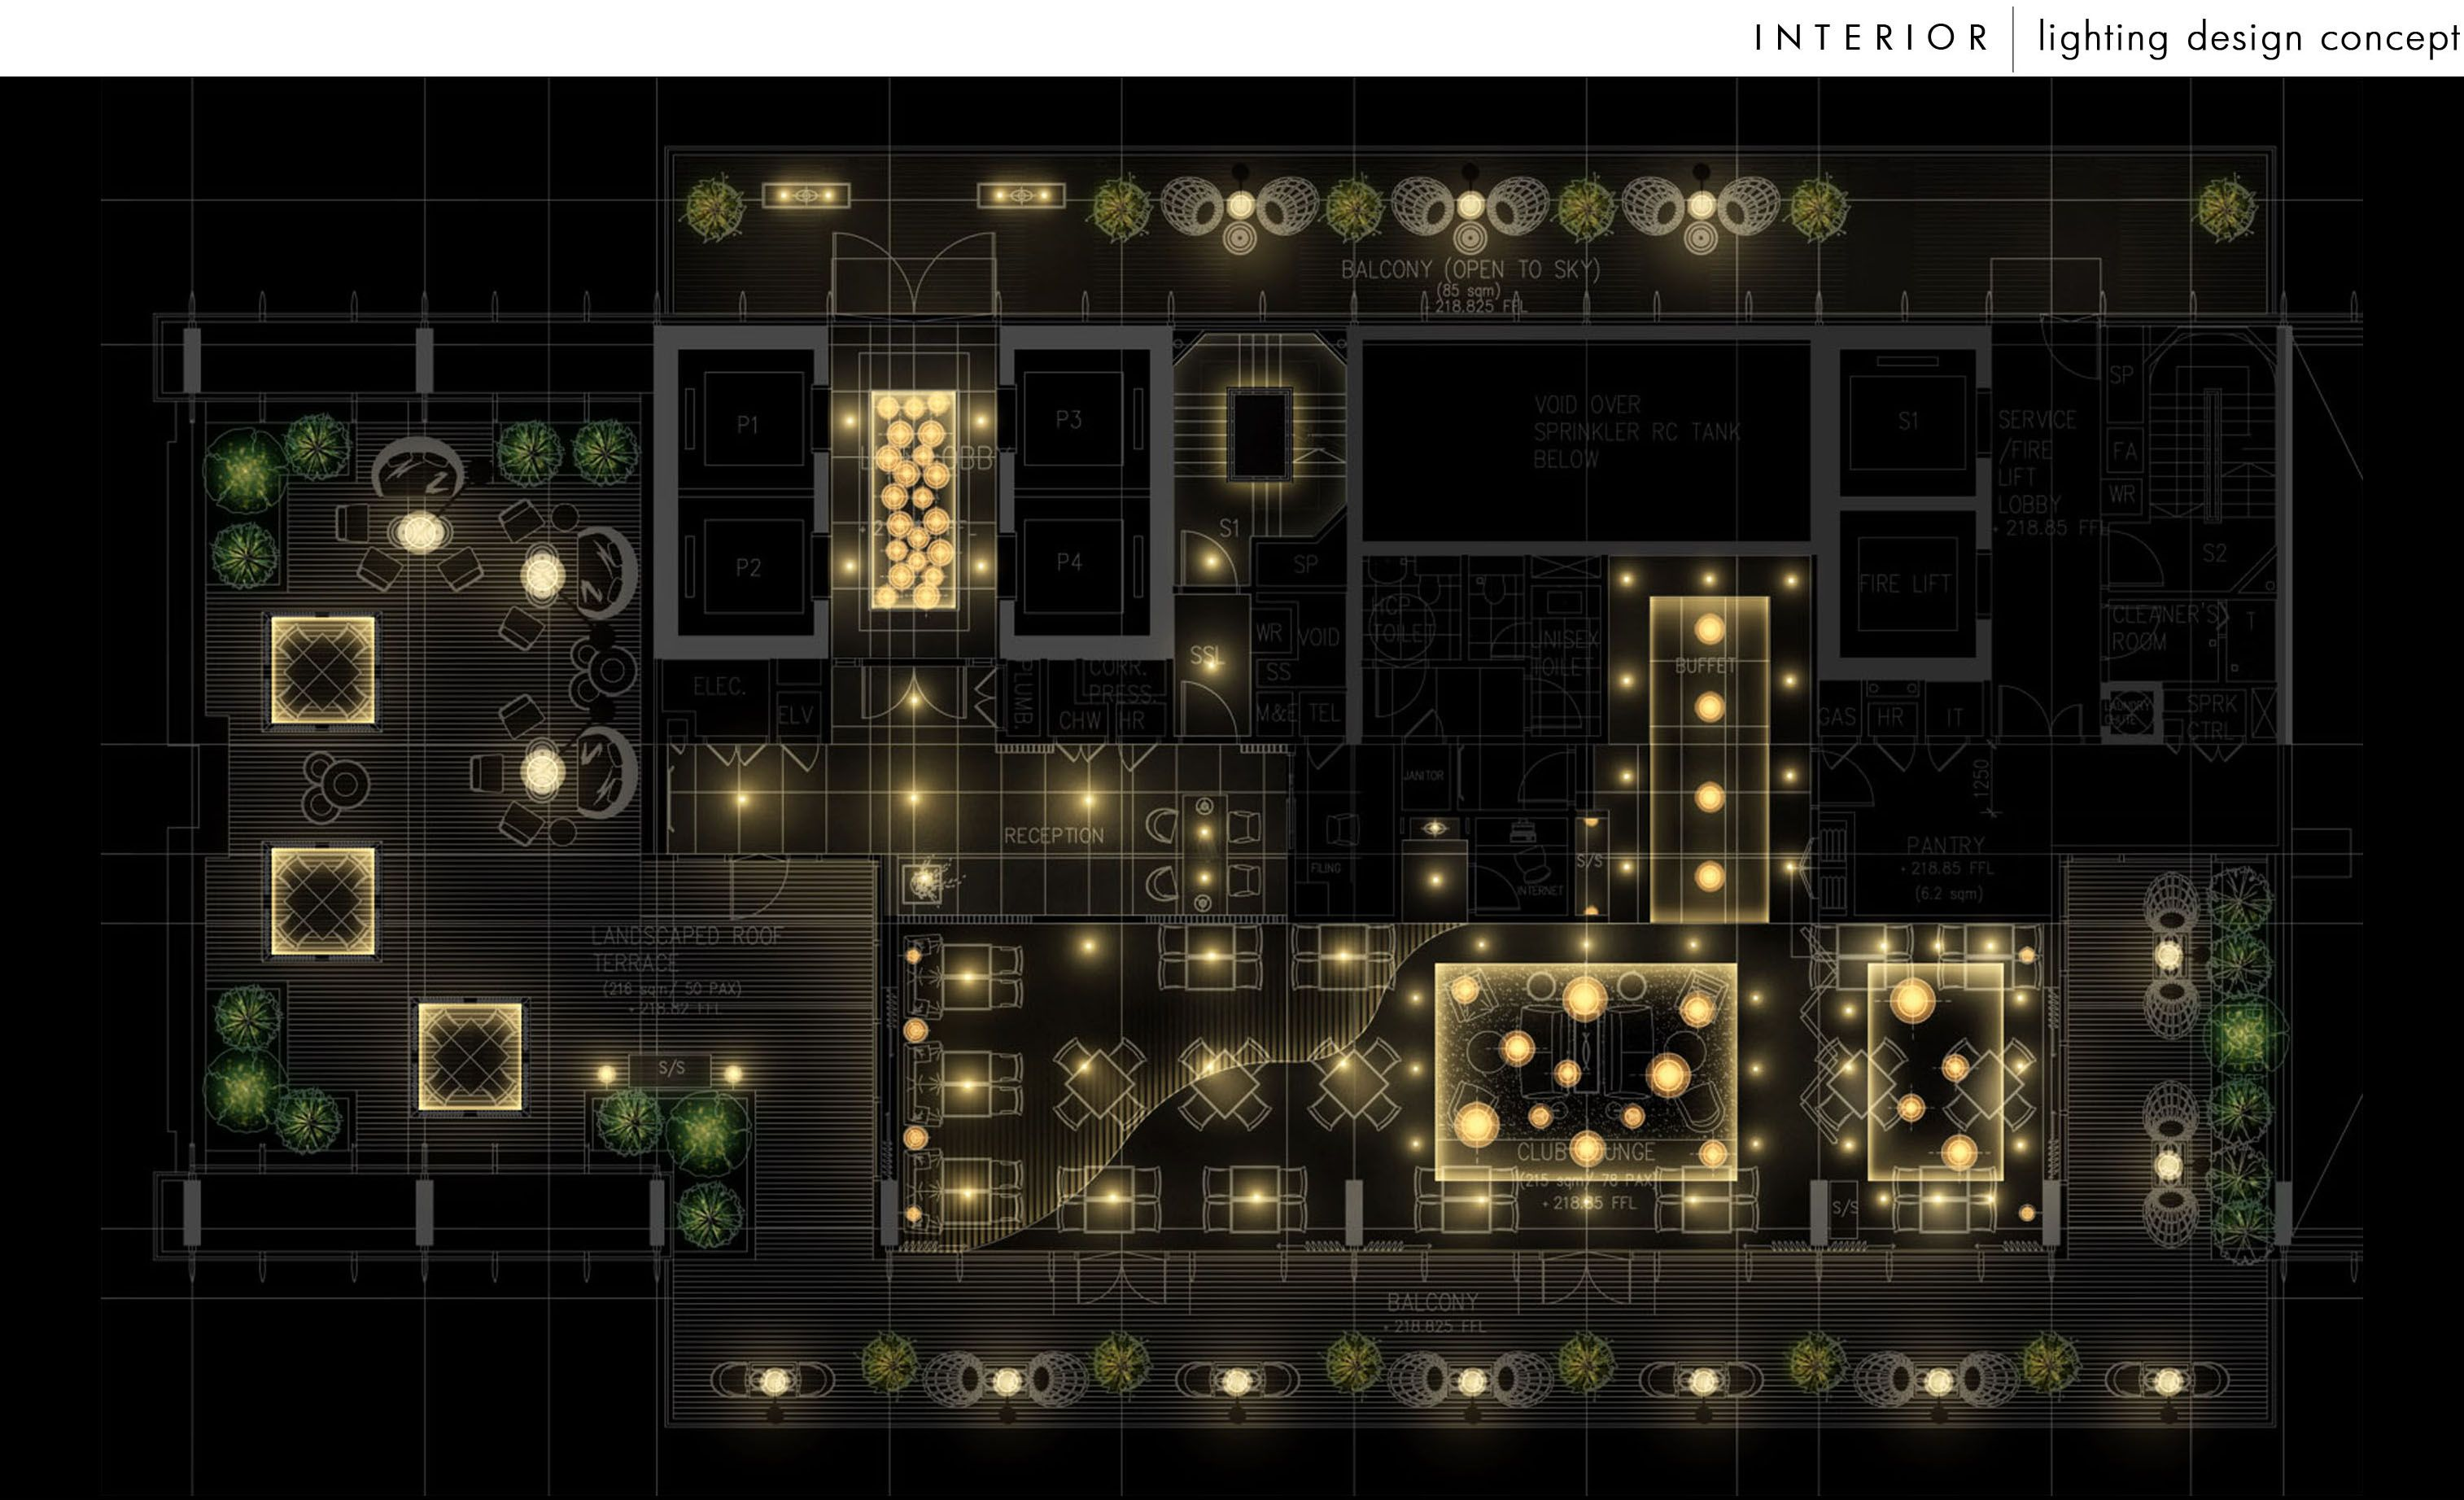 Commercial Interior Lighting Design